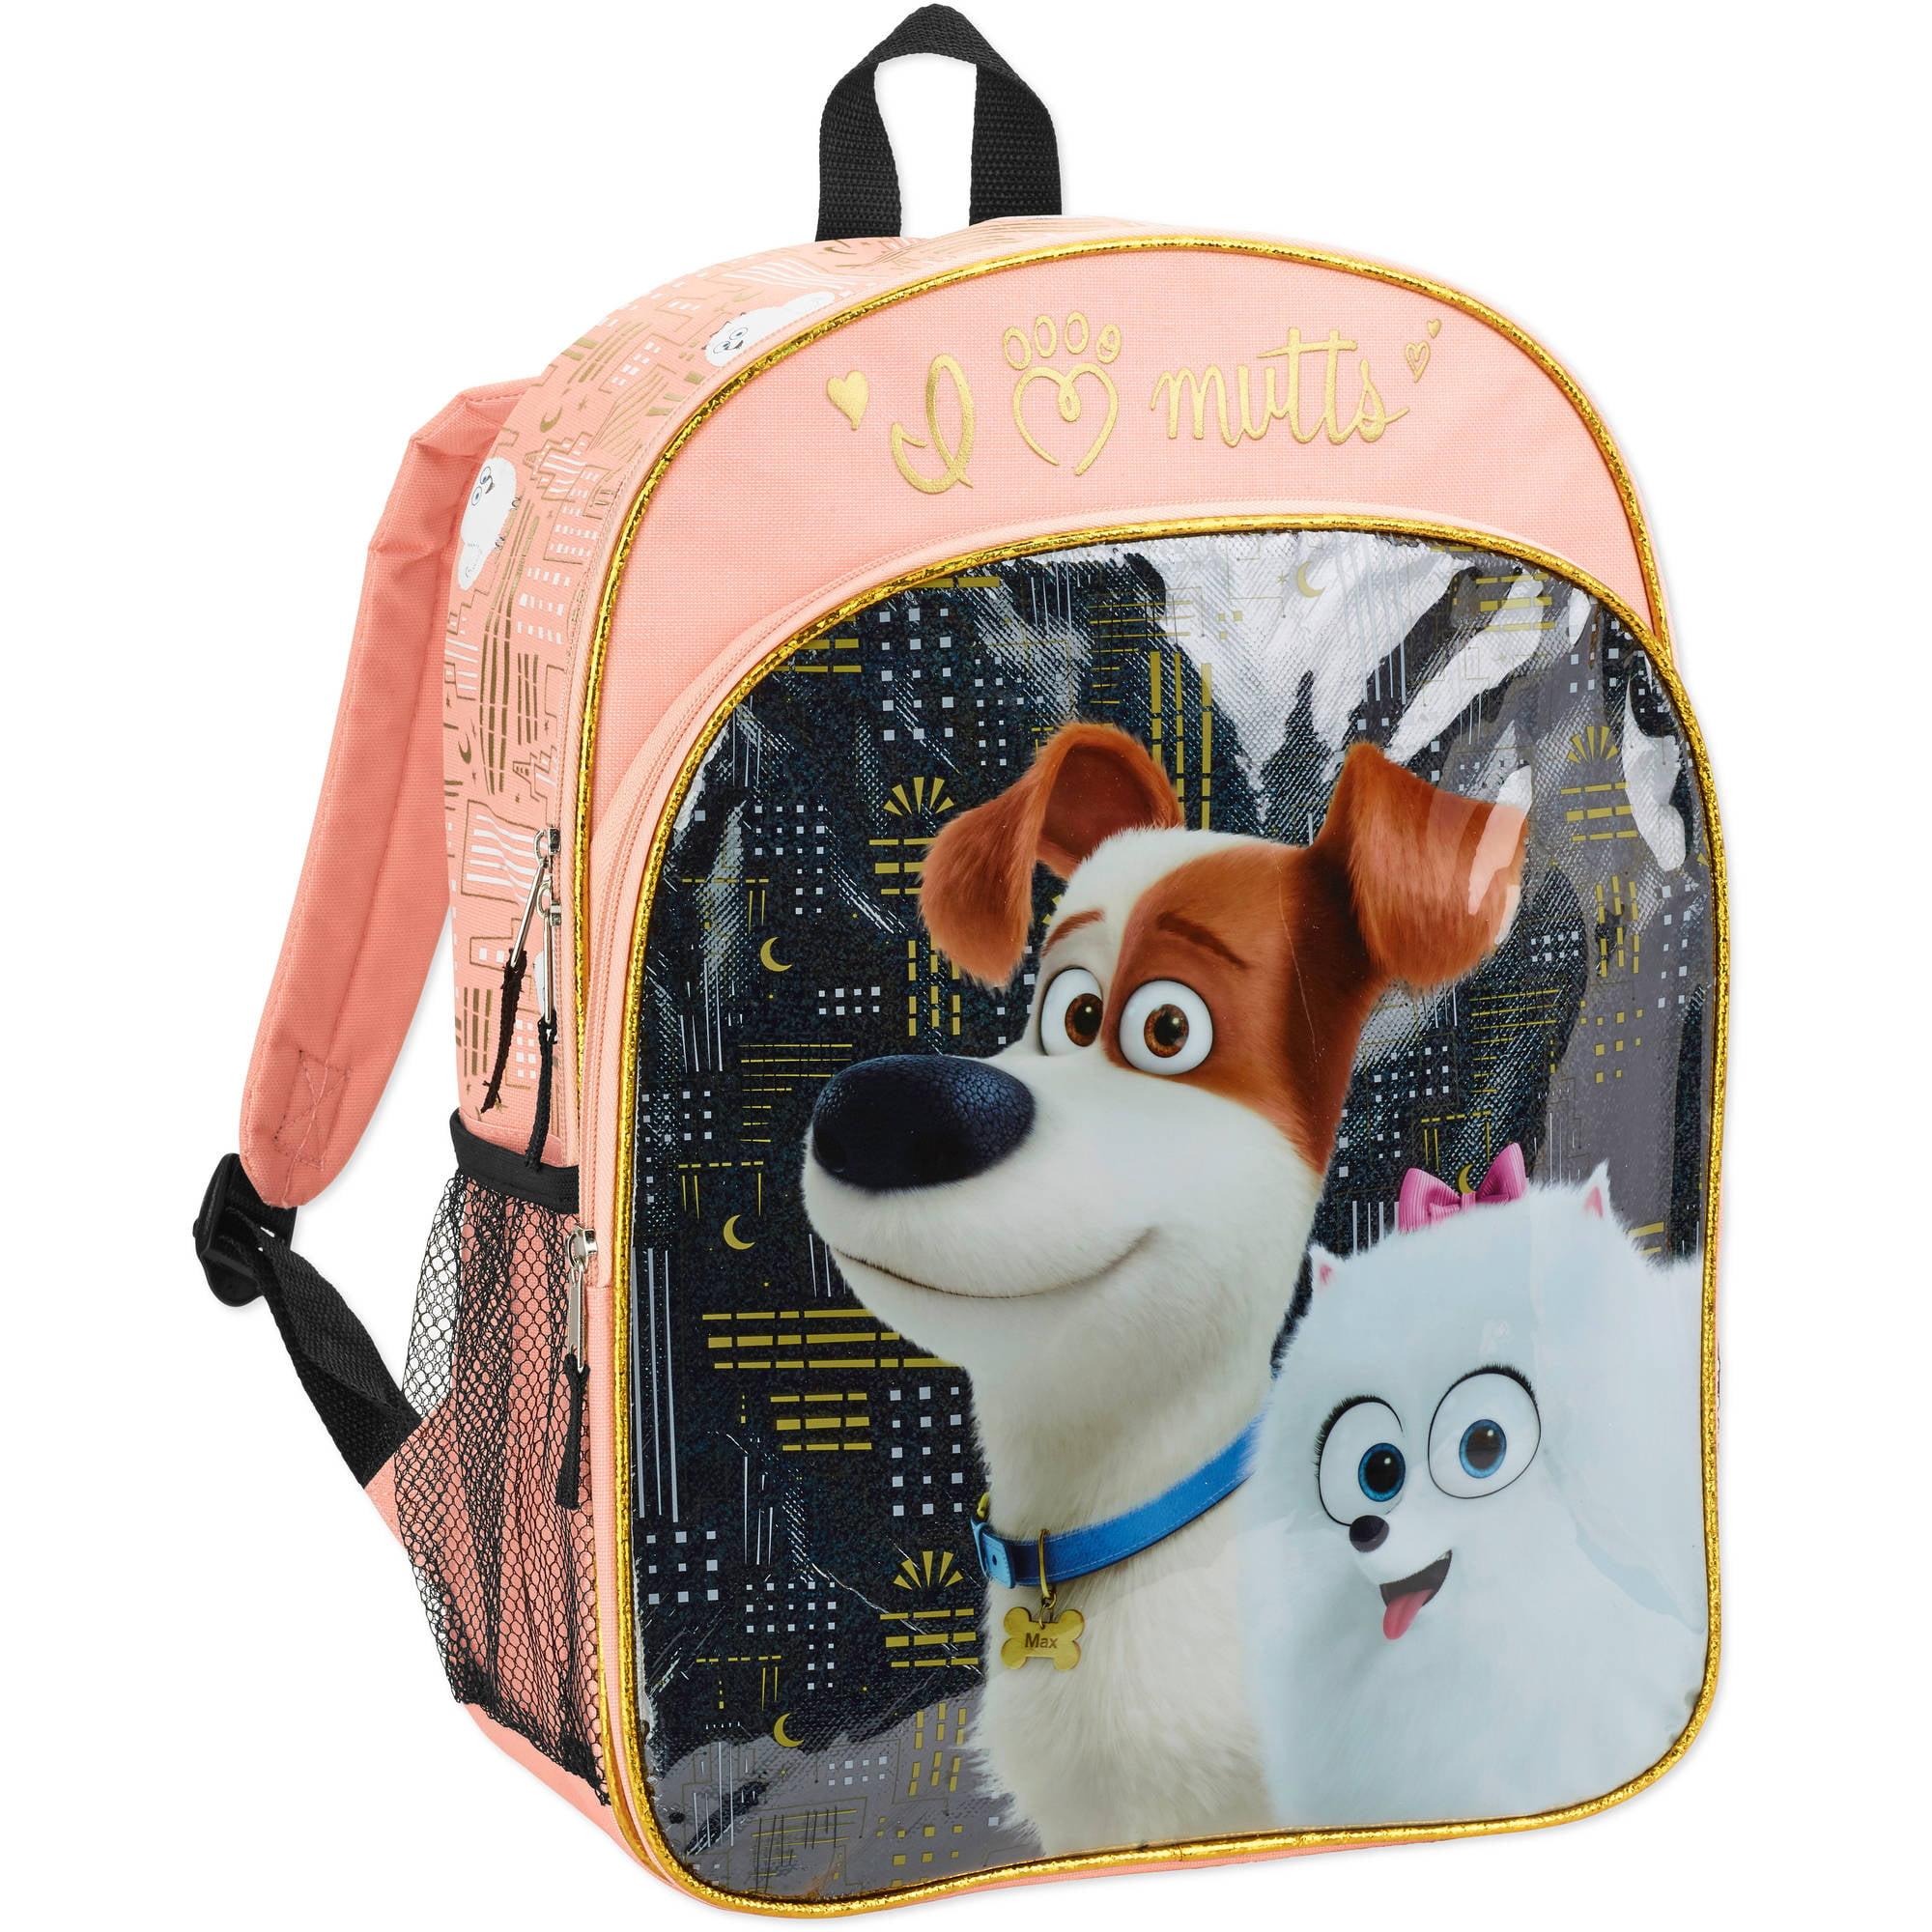 The Secret Life of Pets City Lights Kids' Backpack - Walmart.com